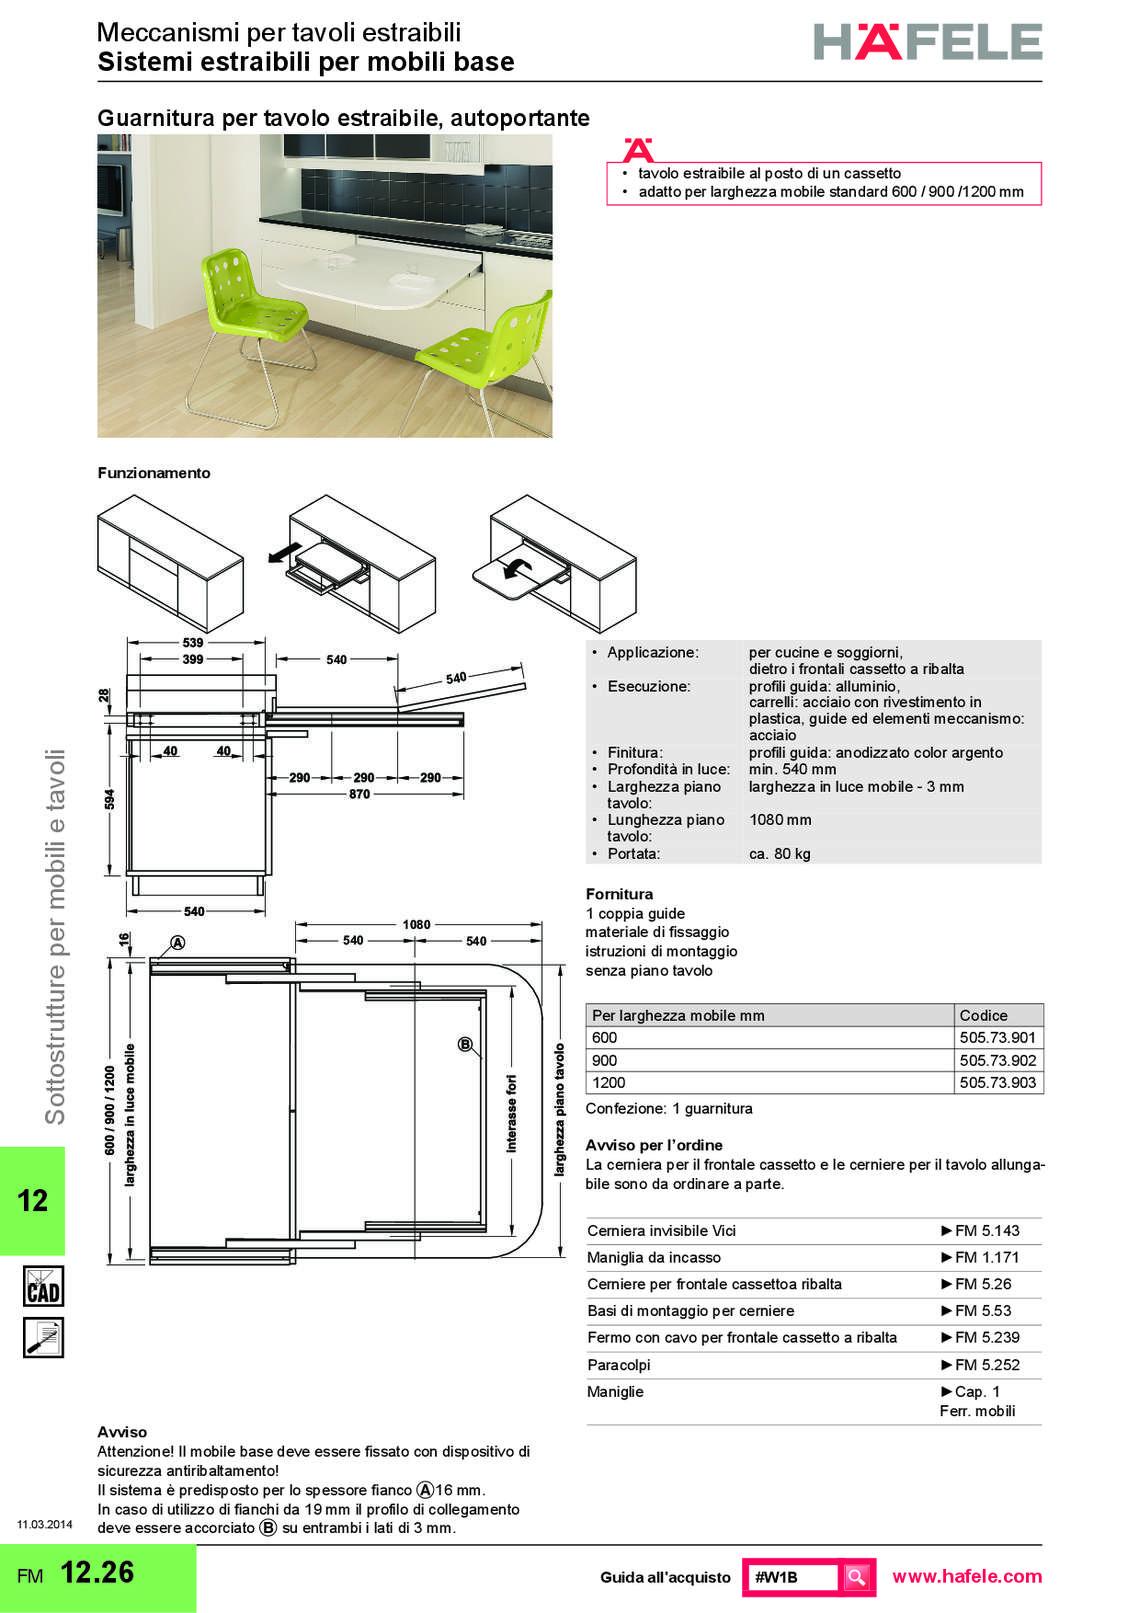 hafele-sottostrutture-per-mobili_83_045.jpg